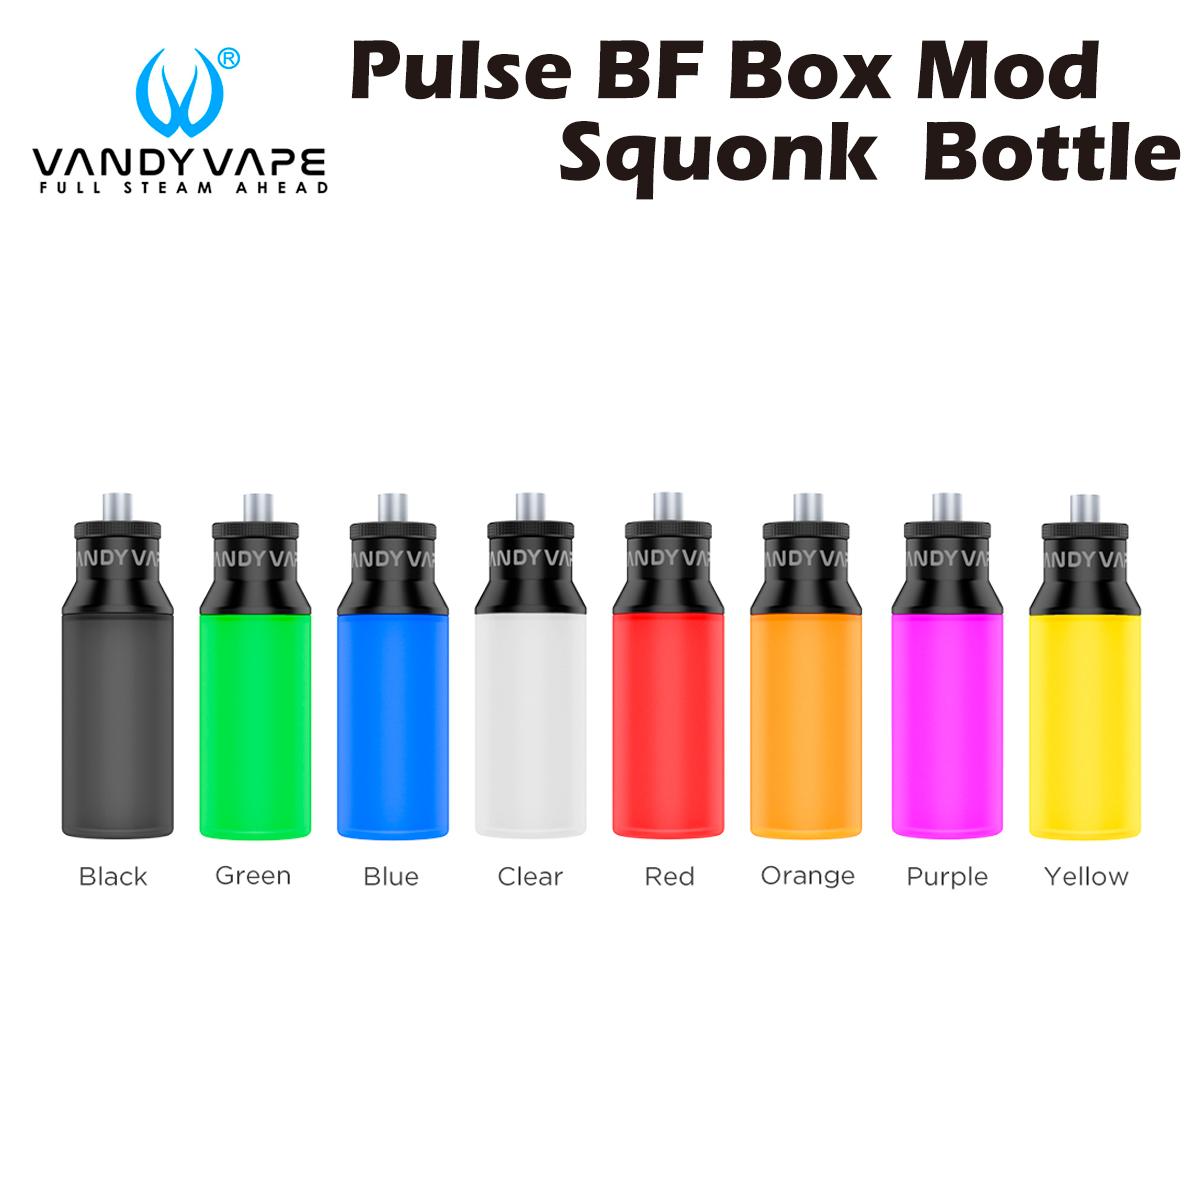 Vandy Vape Pulse 80W BF Box 正規逆輸入品 Mod ☆新作入荷☆新品 Bottle X 90W Squonk パルス バンディベイプ スコンクボトル